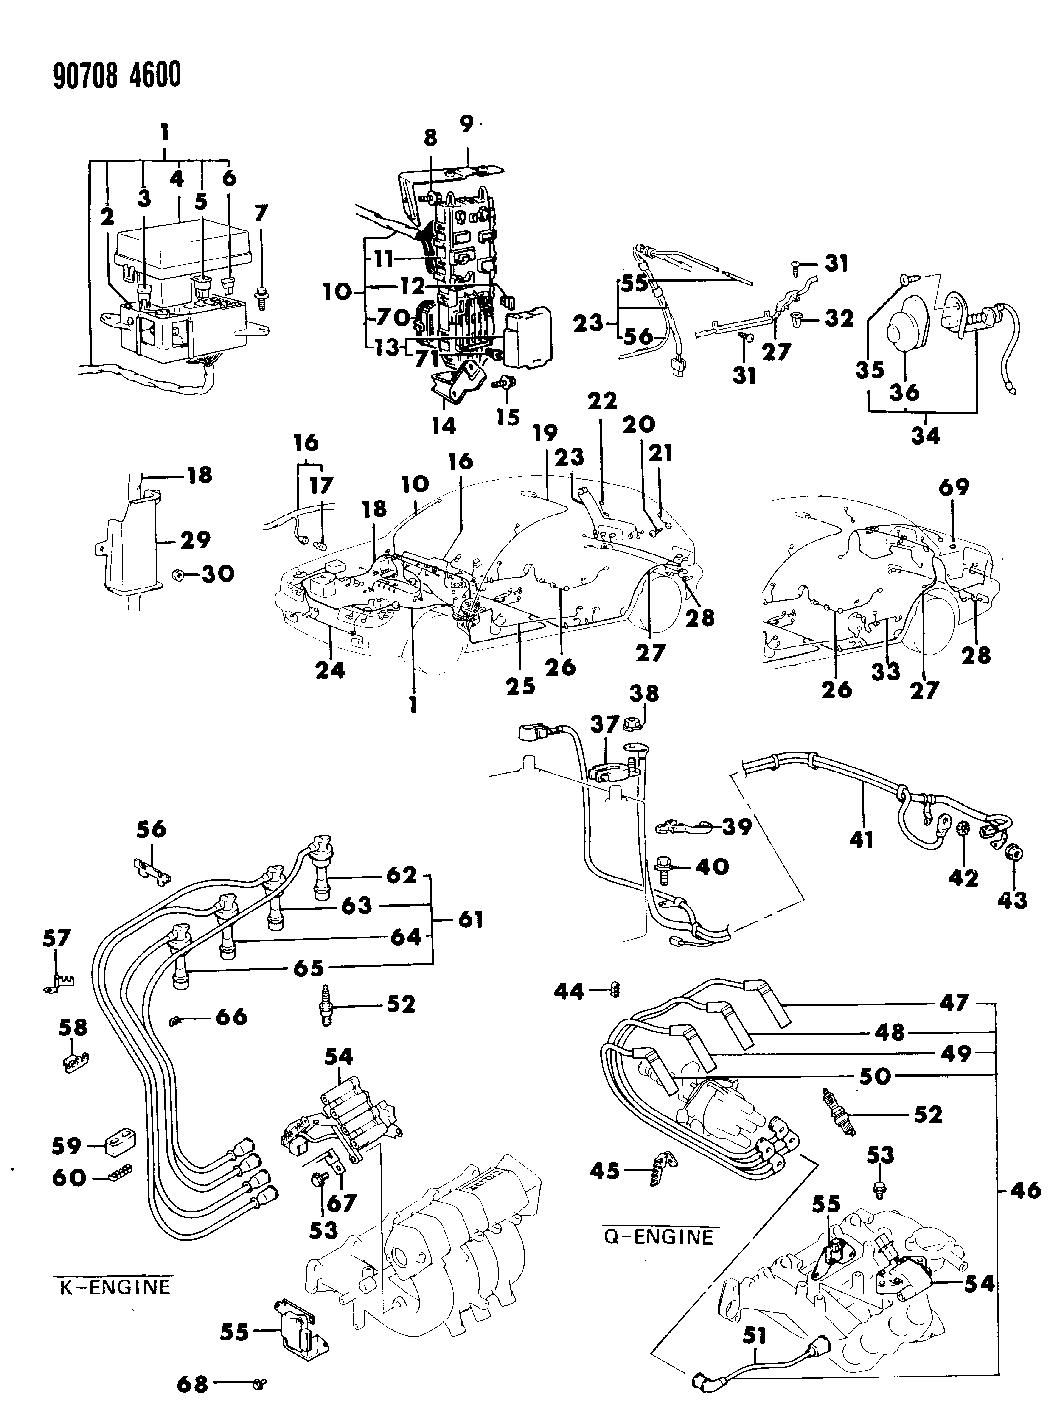 mf140724